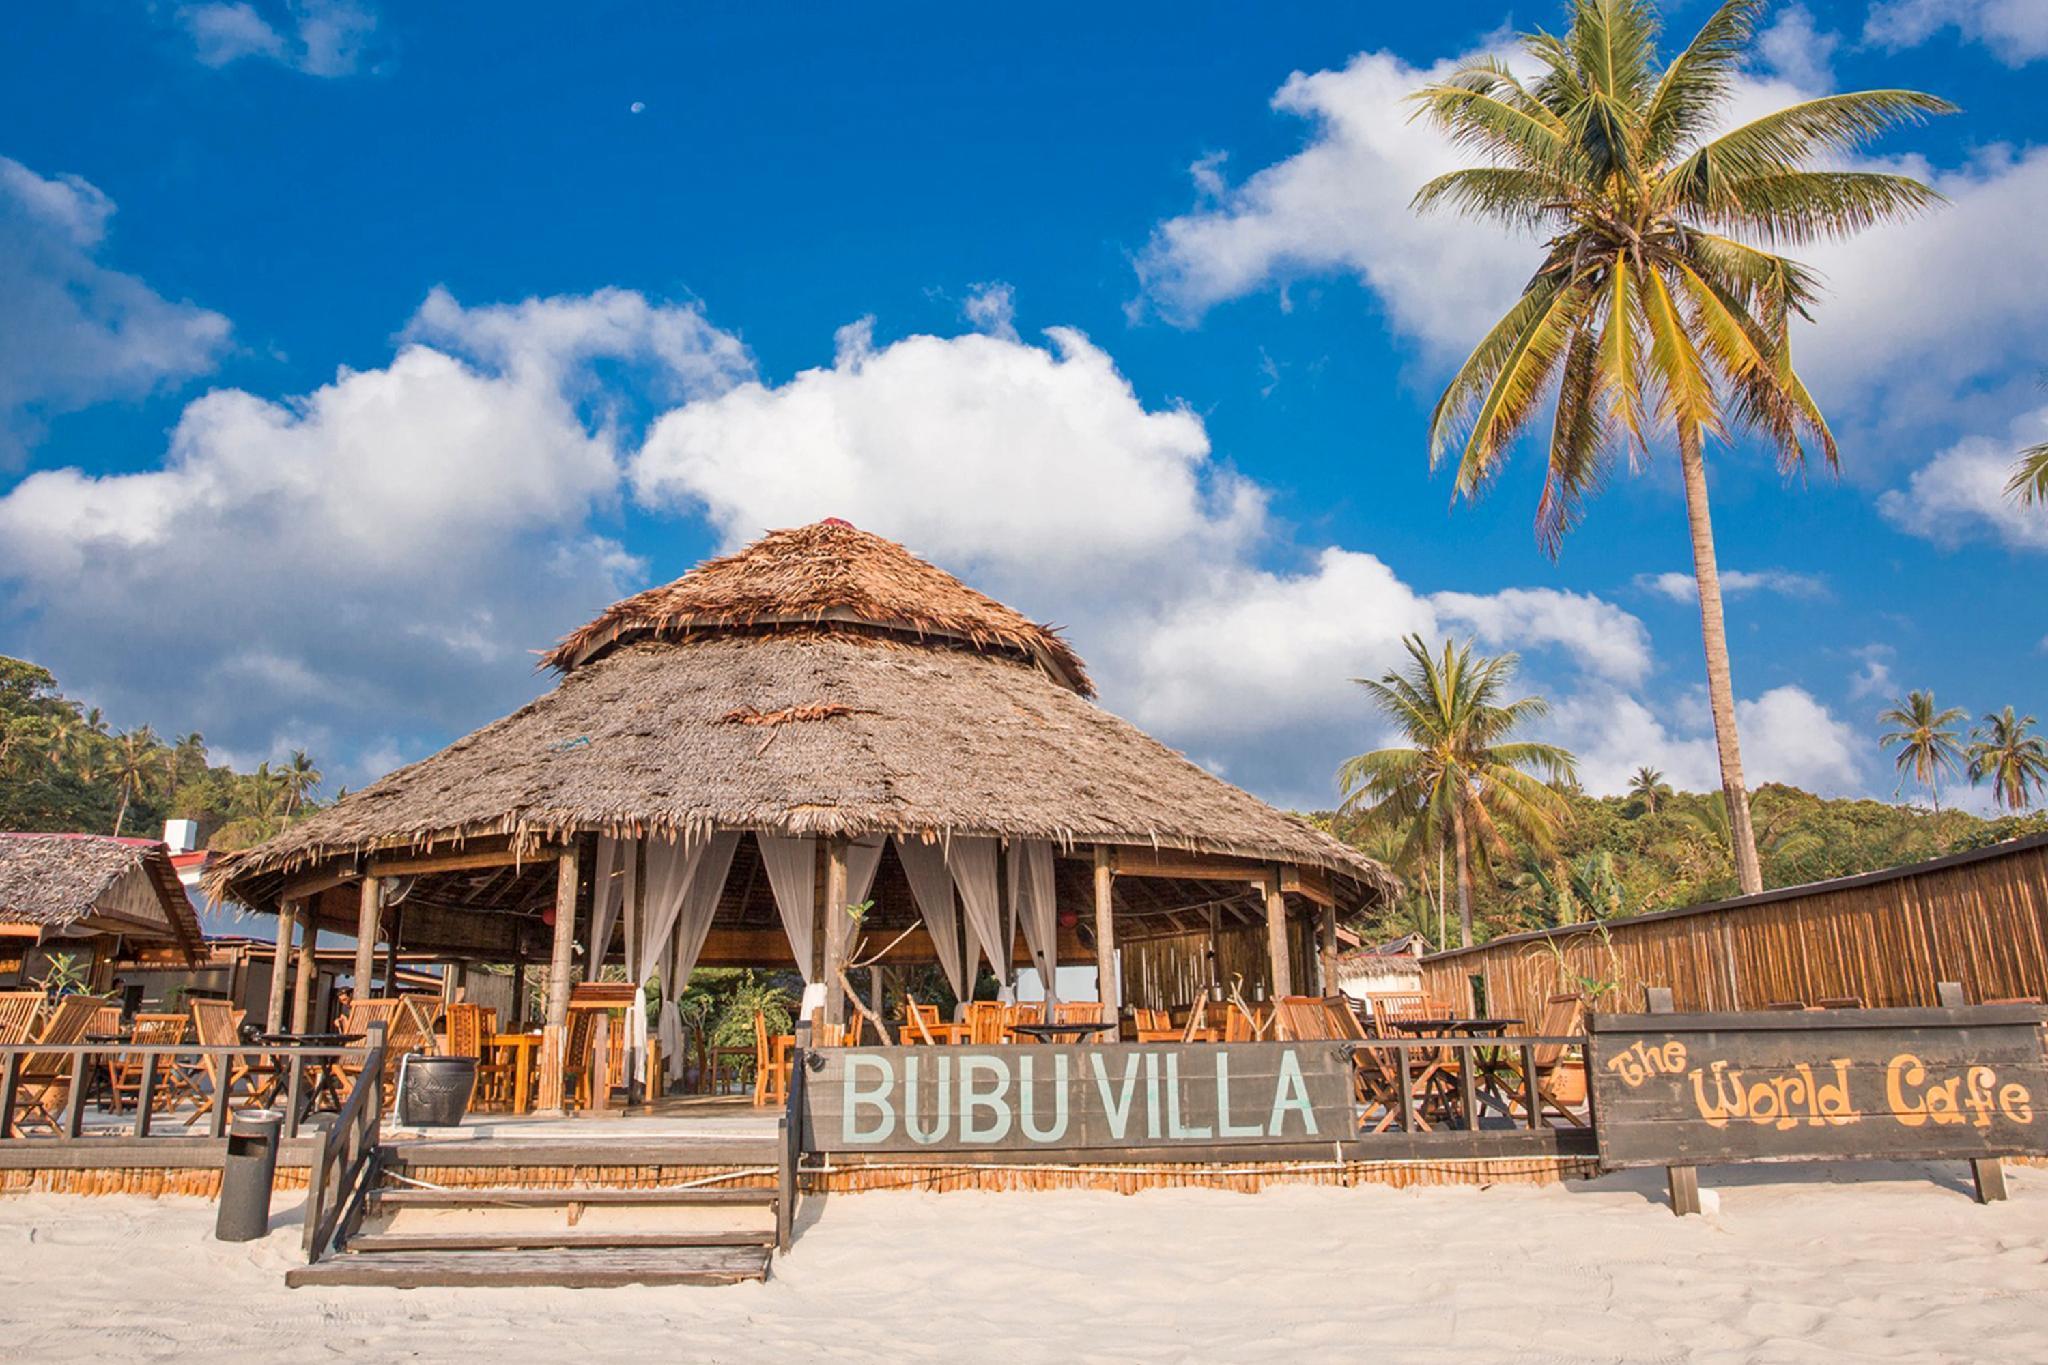 Bubu Villa